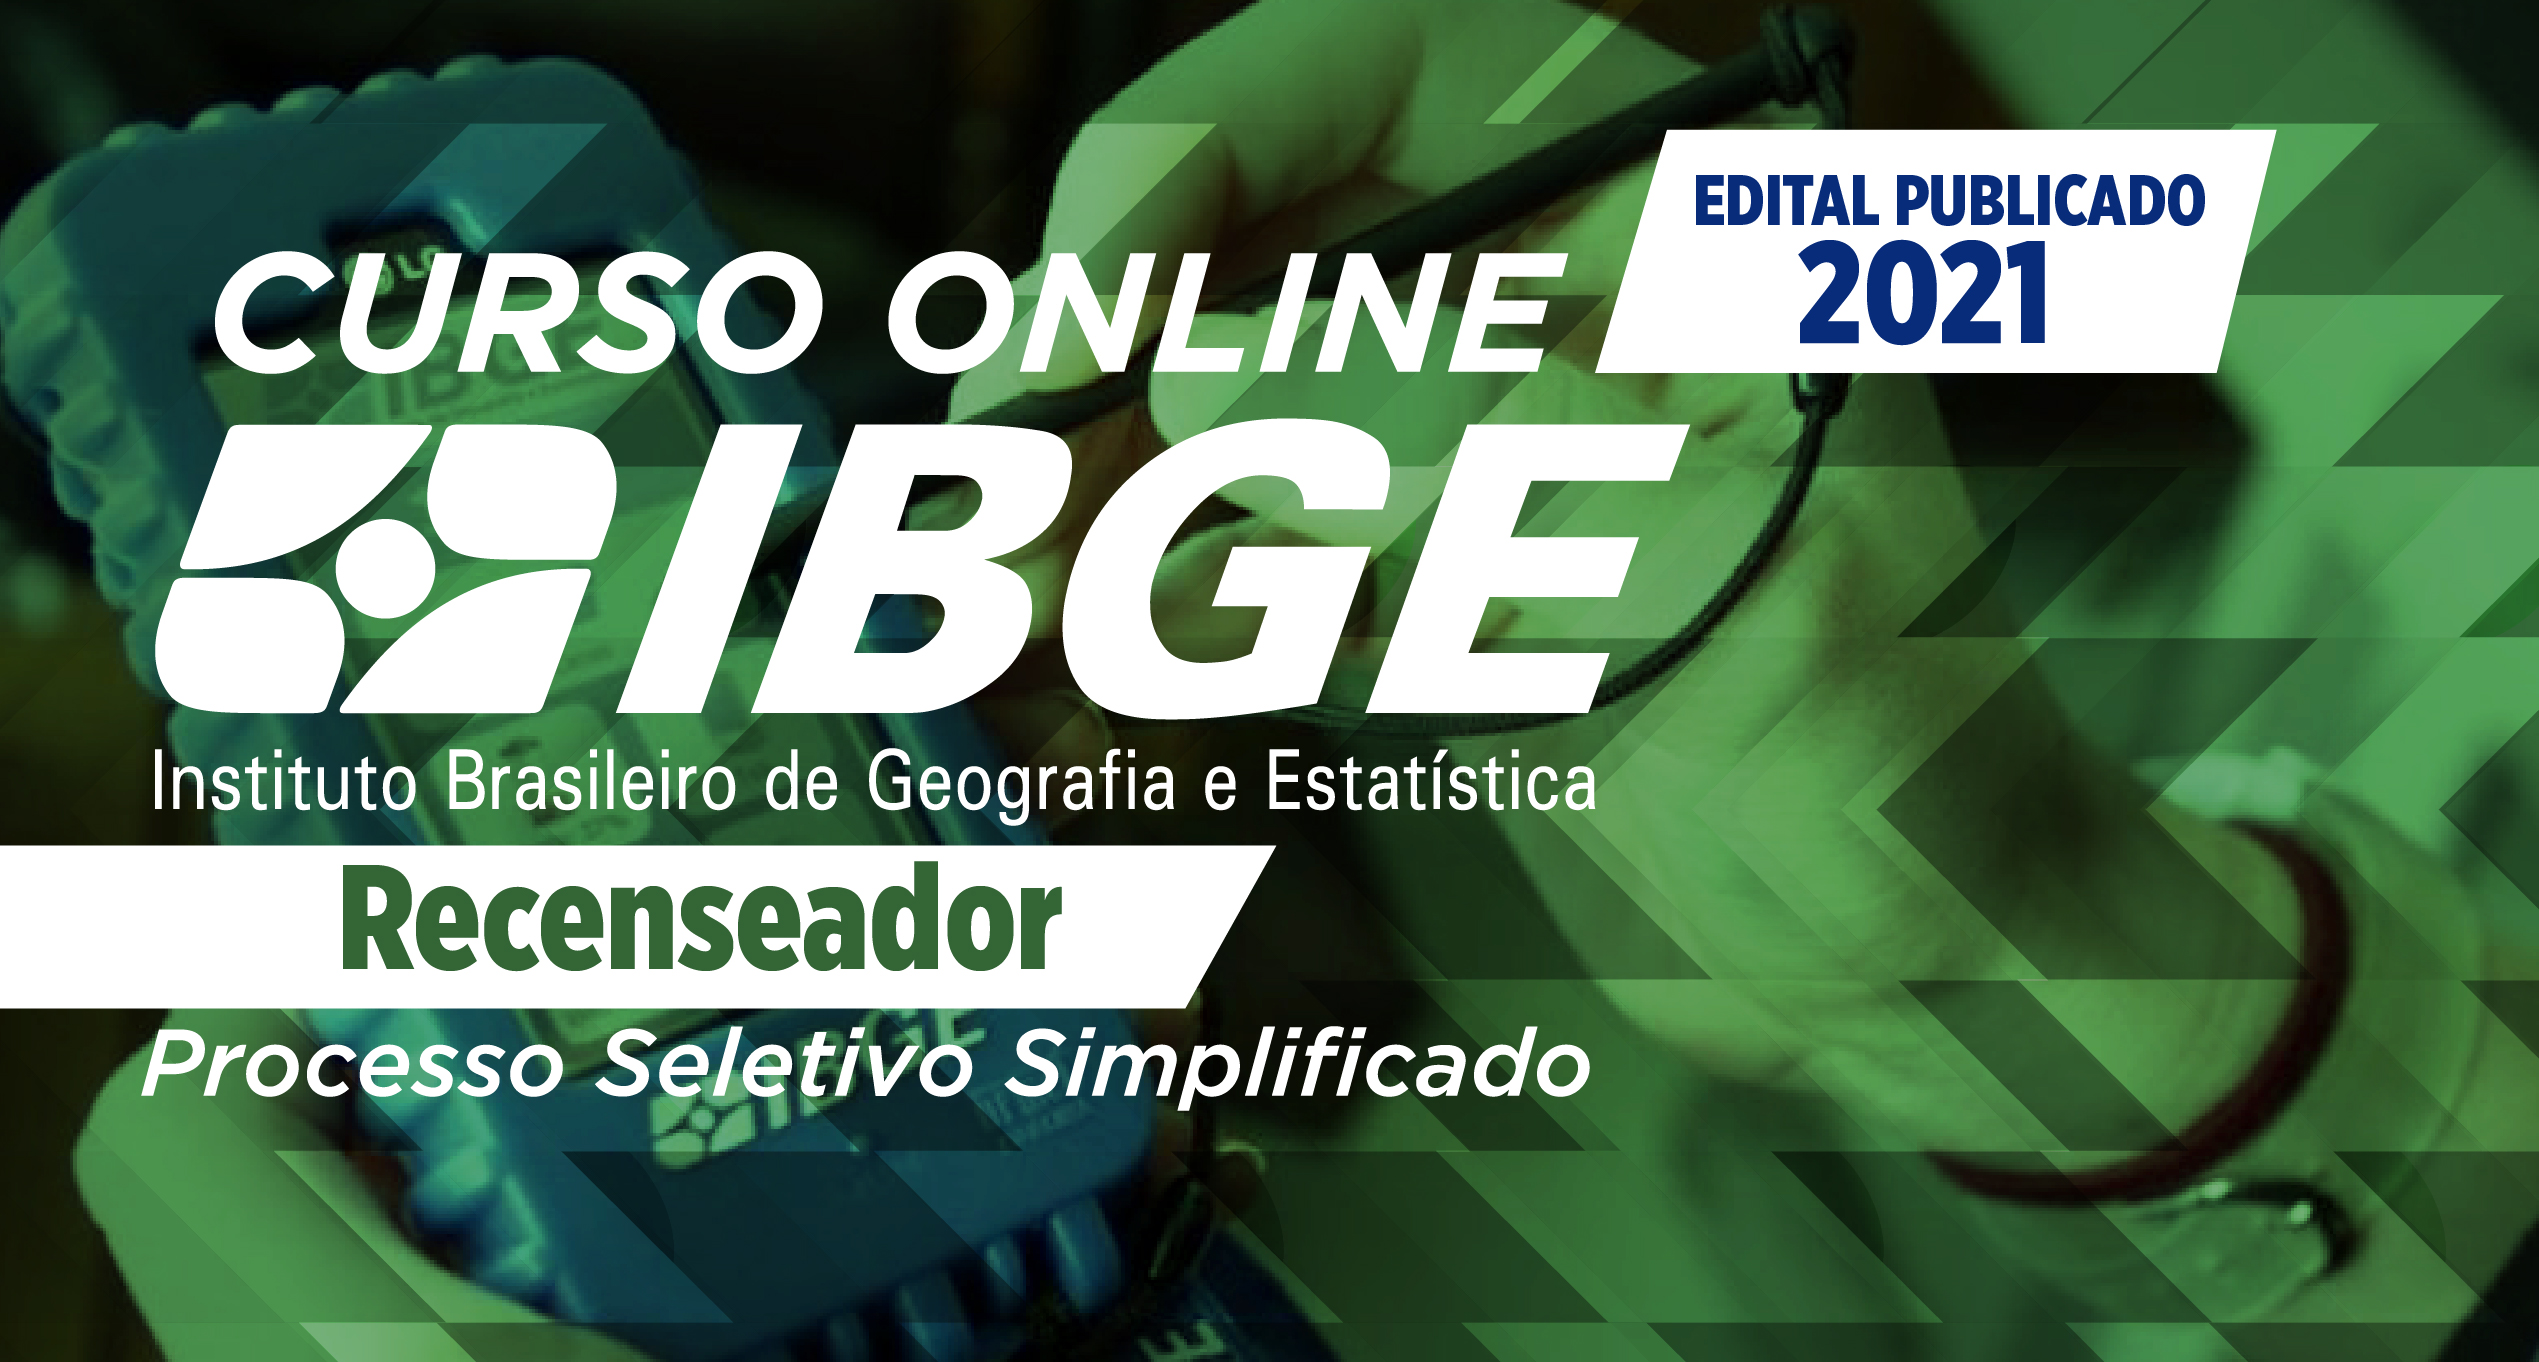 IBGE - Recenseador